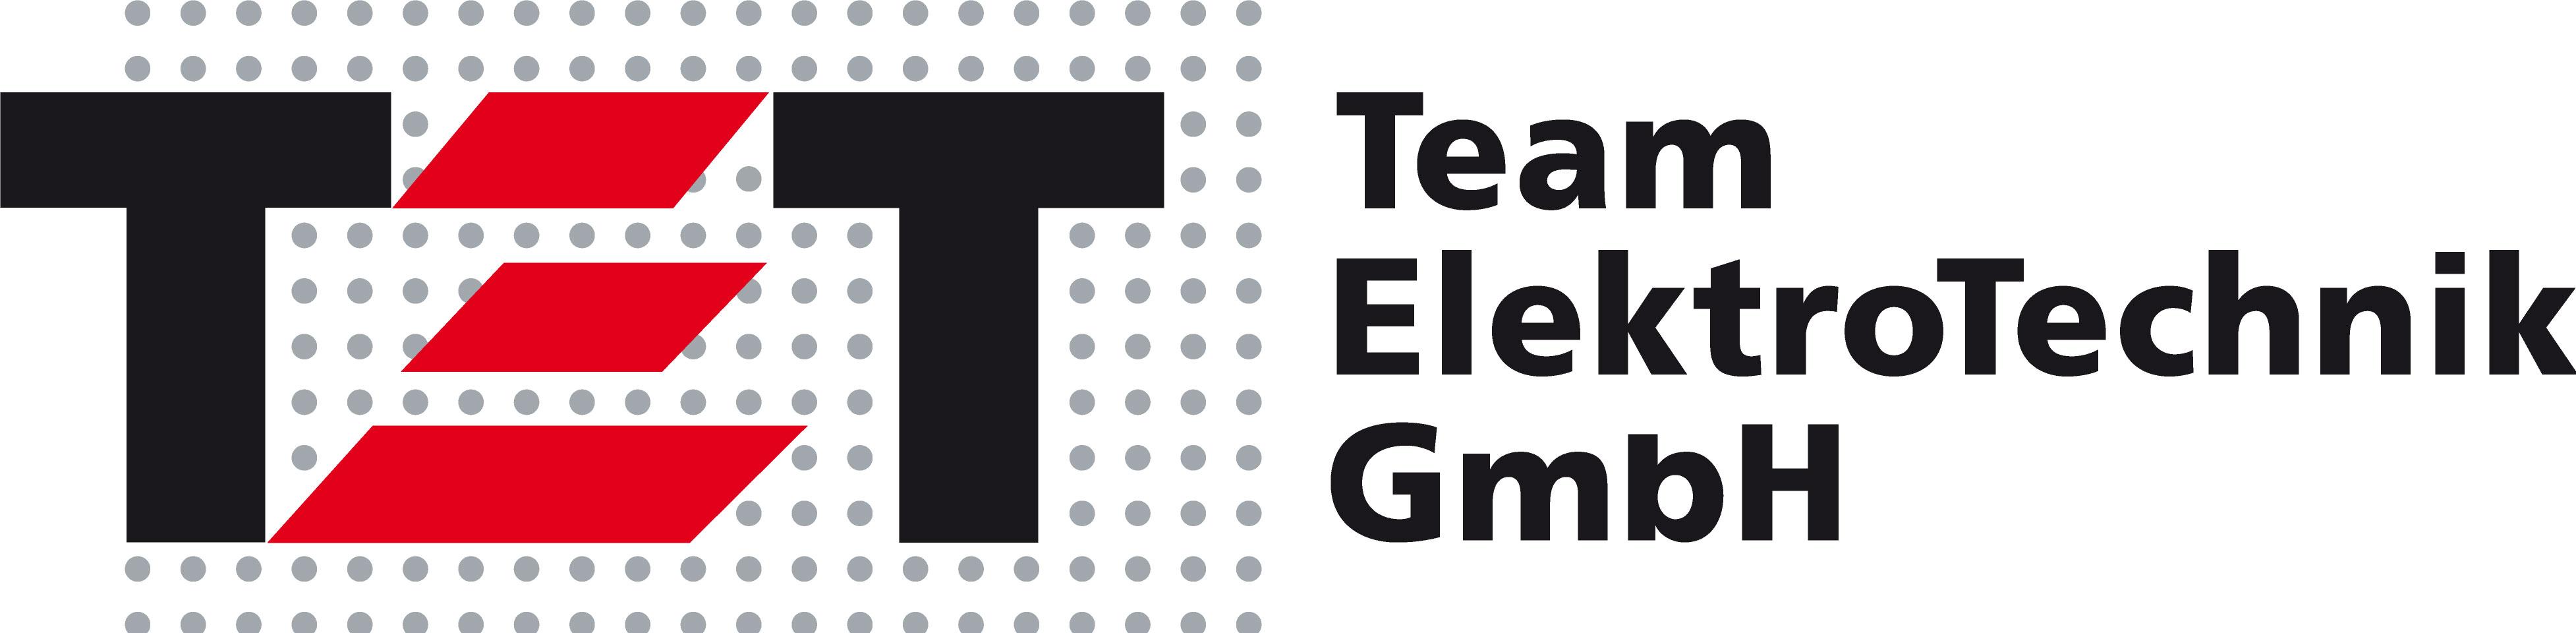 TET Team ElektroTechnik GmbH Oberhausen